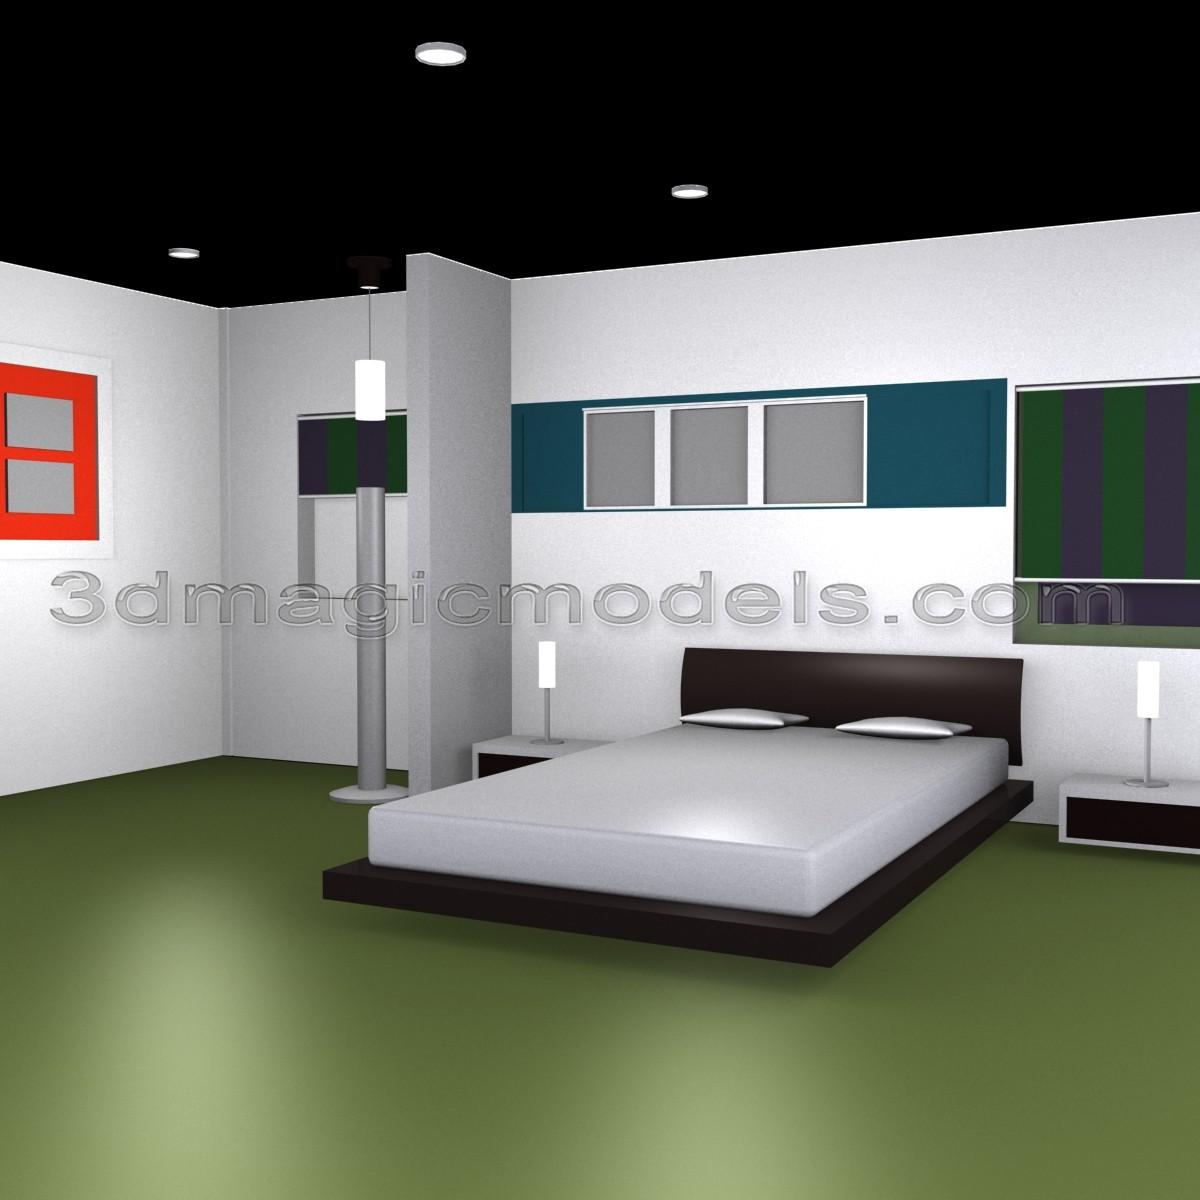 Best Design Wallpapers Modern Bedroom   Decoseecom 1200x1200